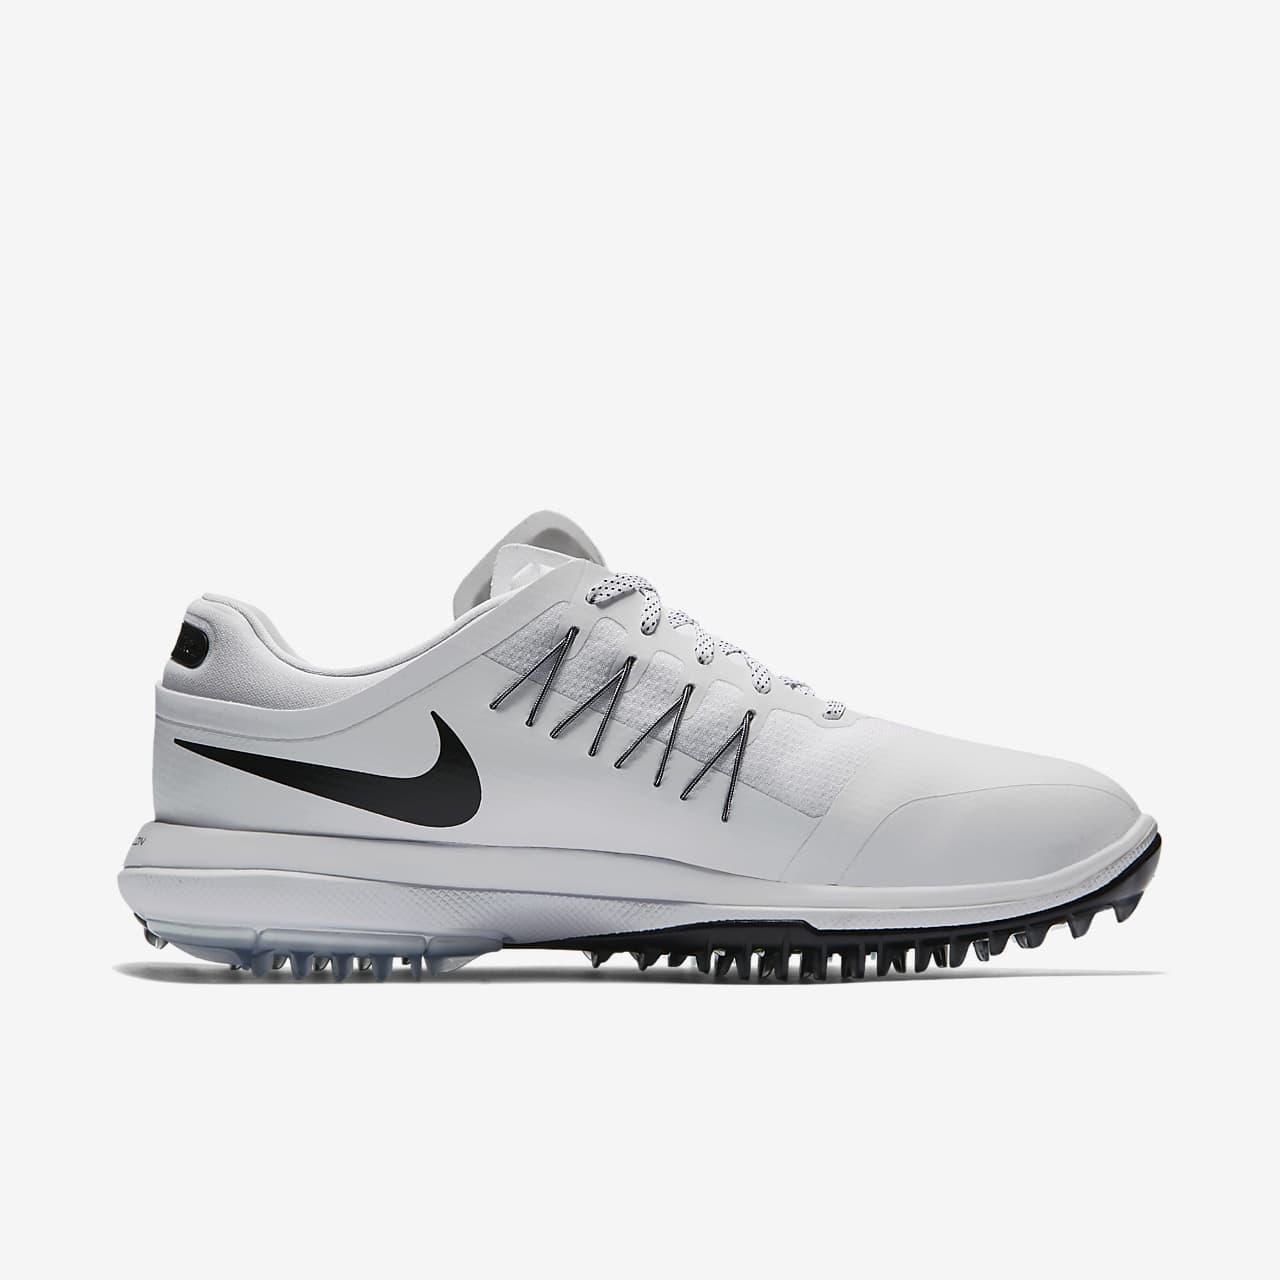 nike lunar golf shoes australia